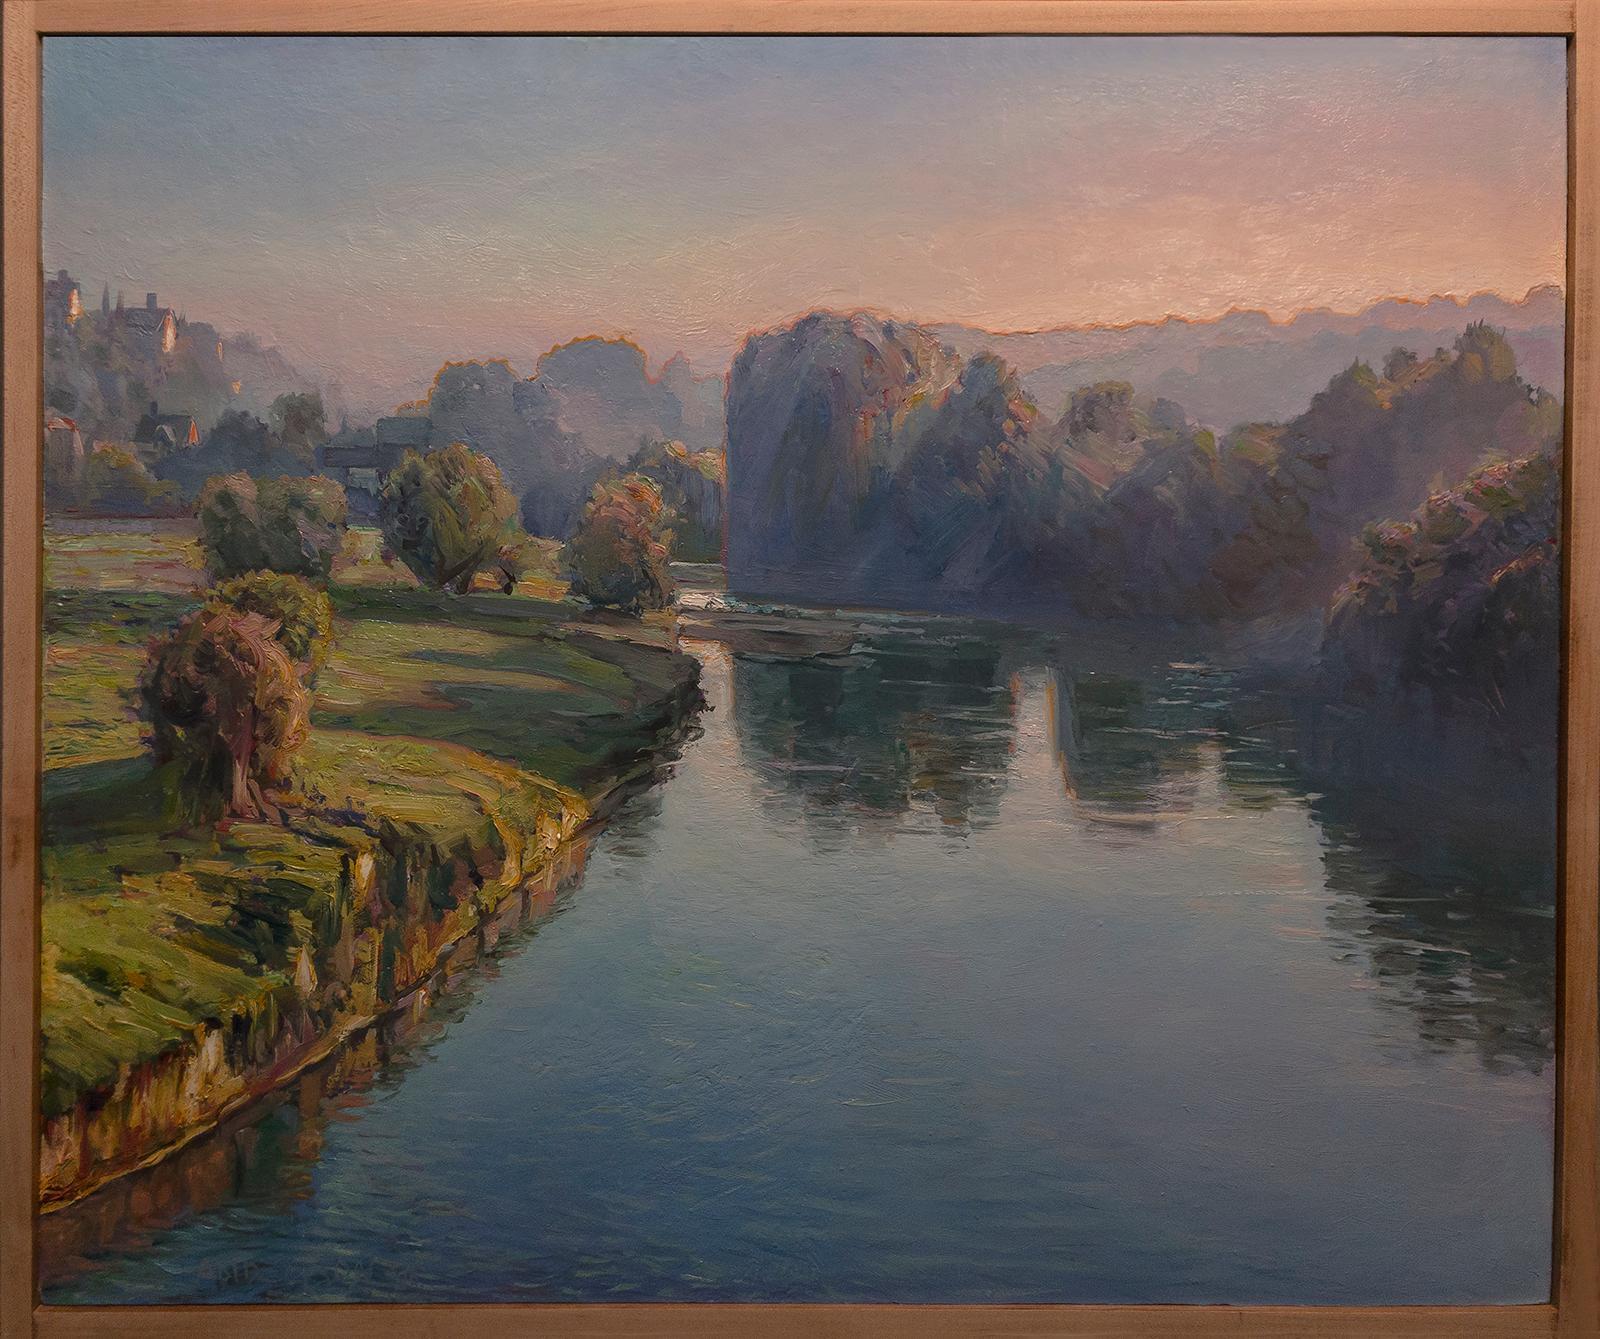 DAYBREAK - Contemporary Impressionist landscape - water